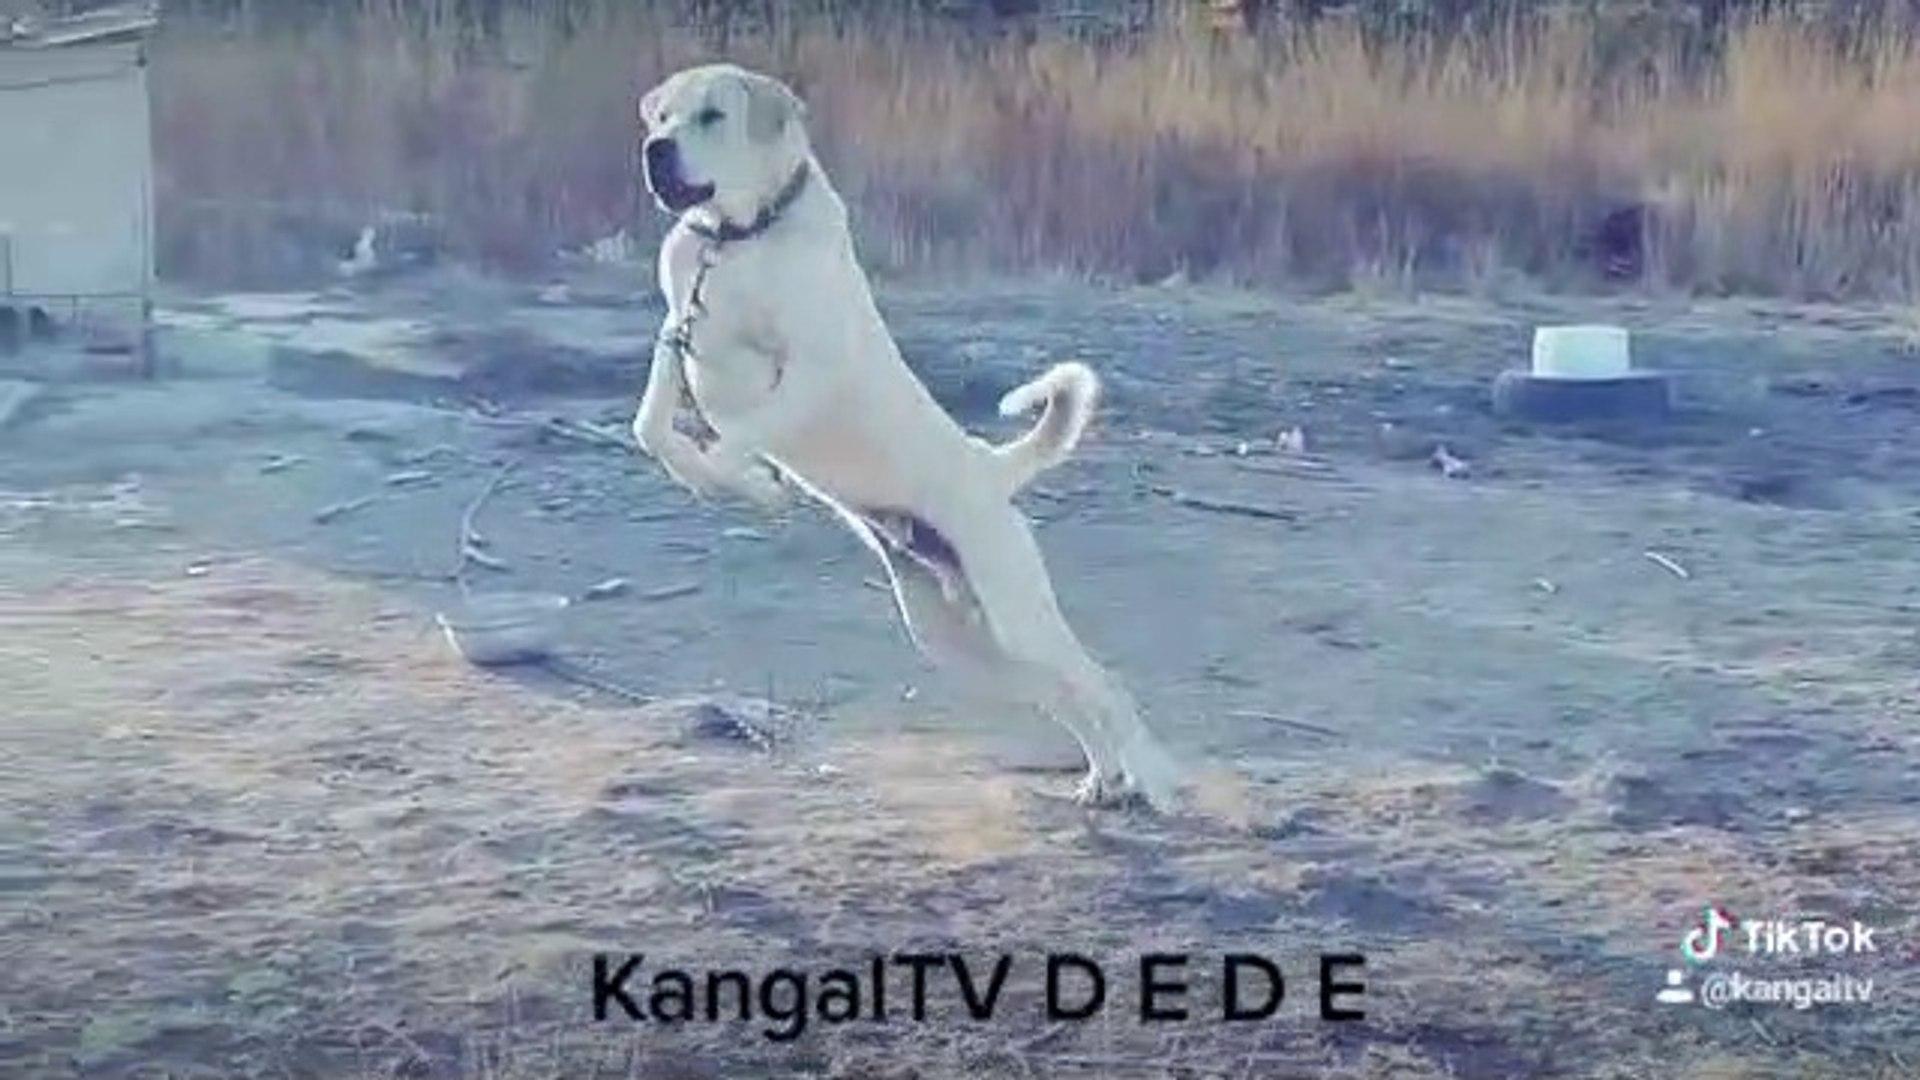 KANGALTV DEDE ANADOLU COBAN KOPEGi AZ KIZMIS - ANATOLiAN SHEPHERD DOG in GARDEN